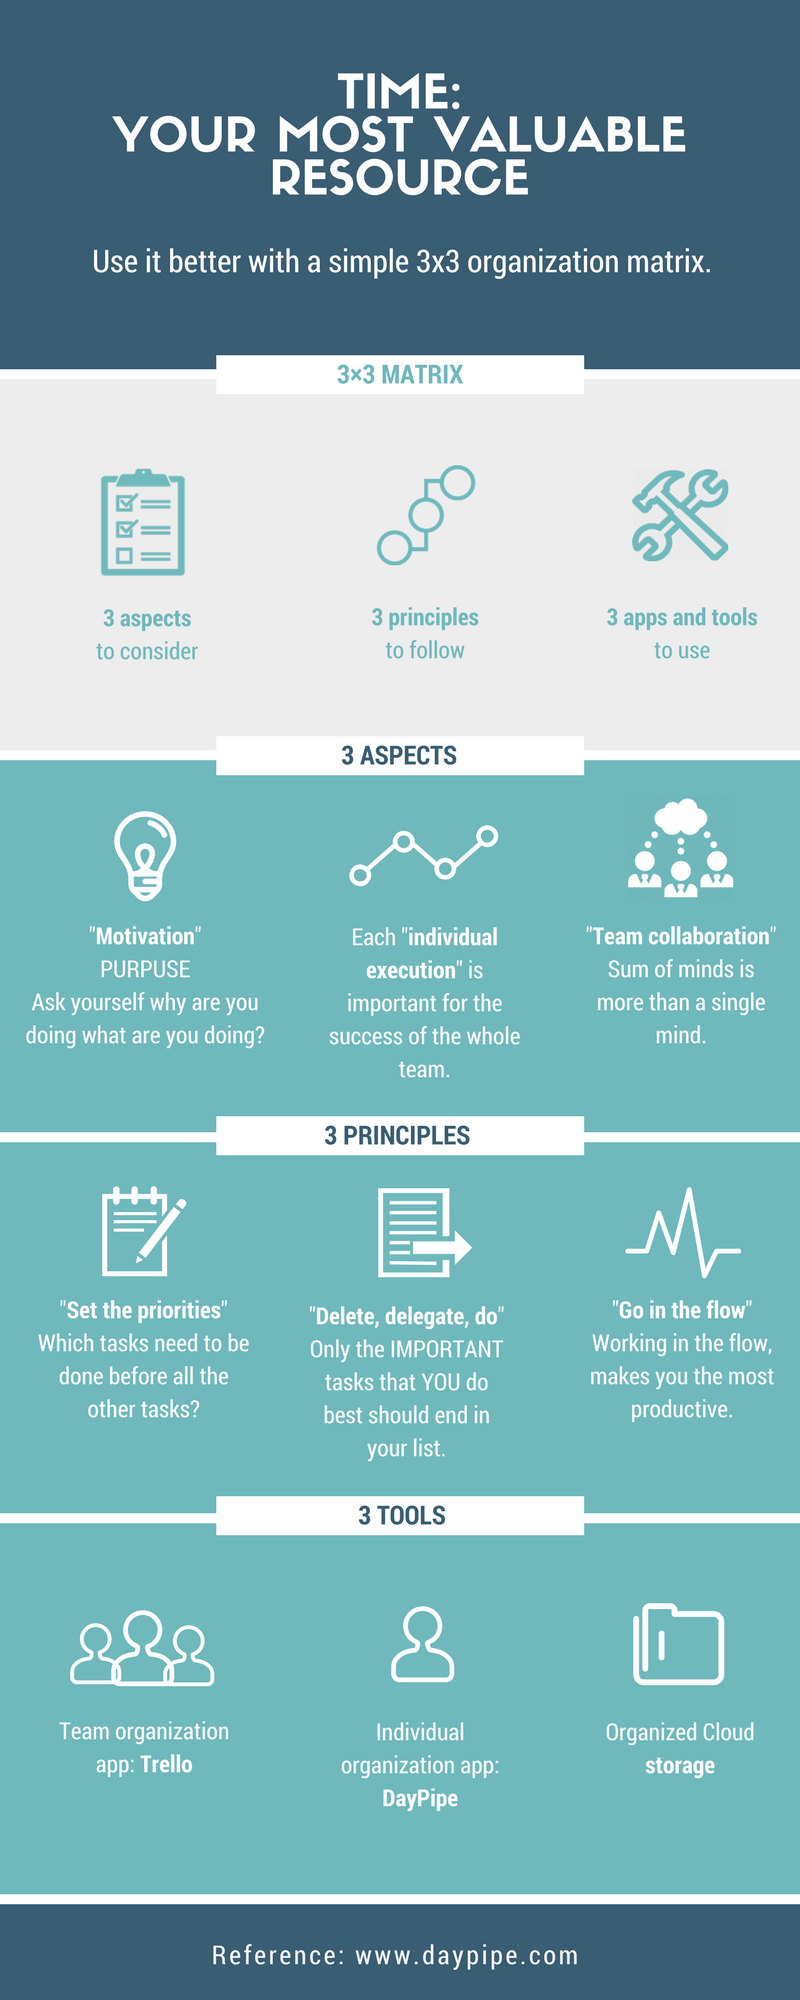 dayPipe-Infographic-3x3-time-organization-matrix